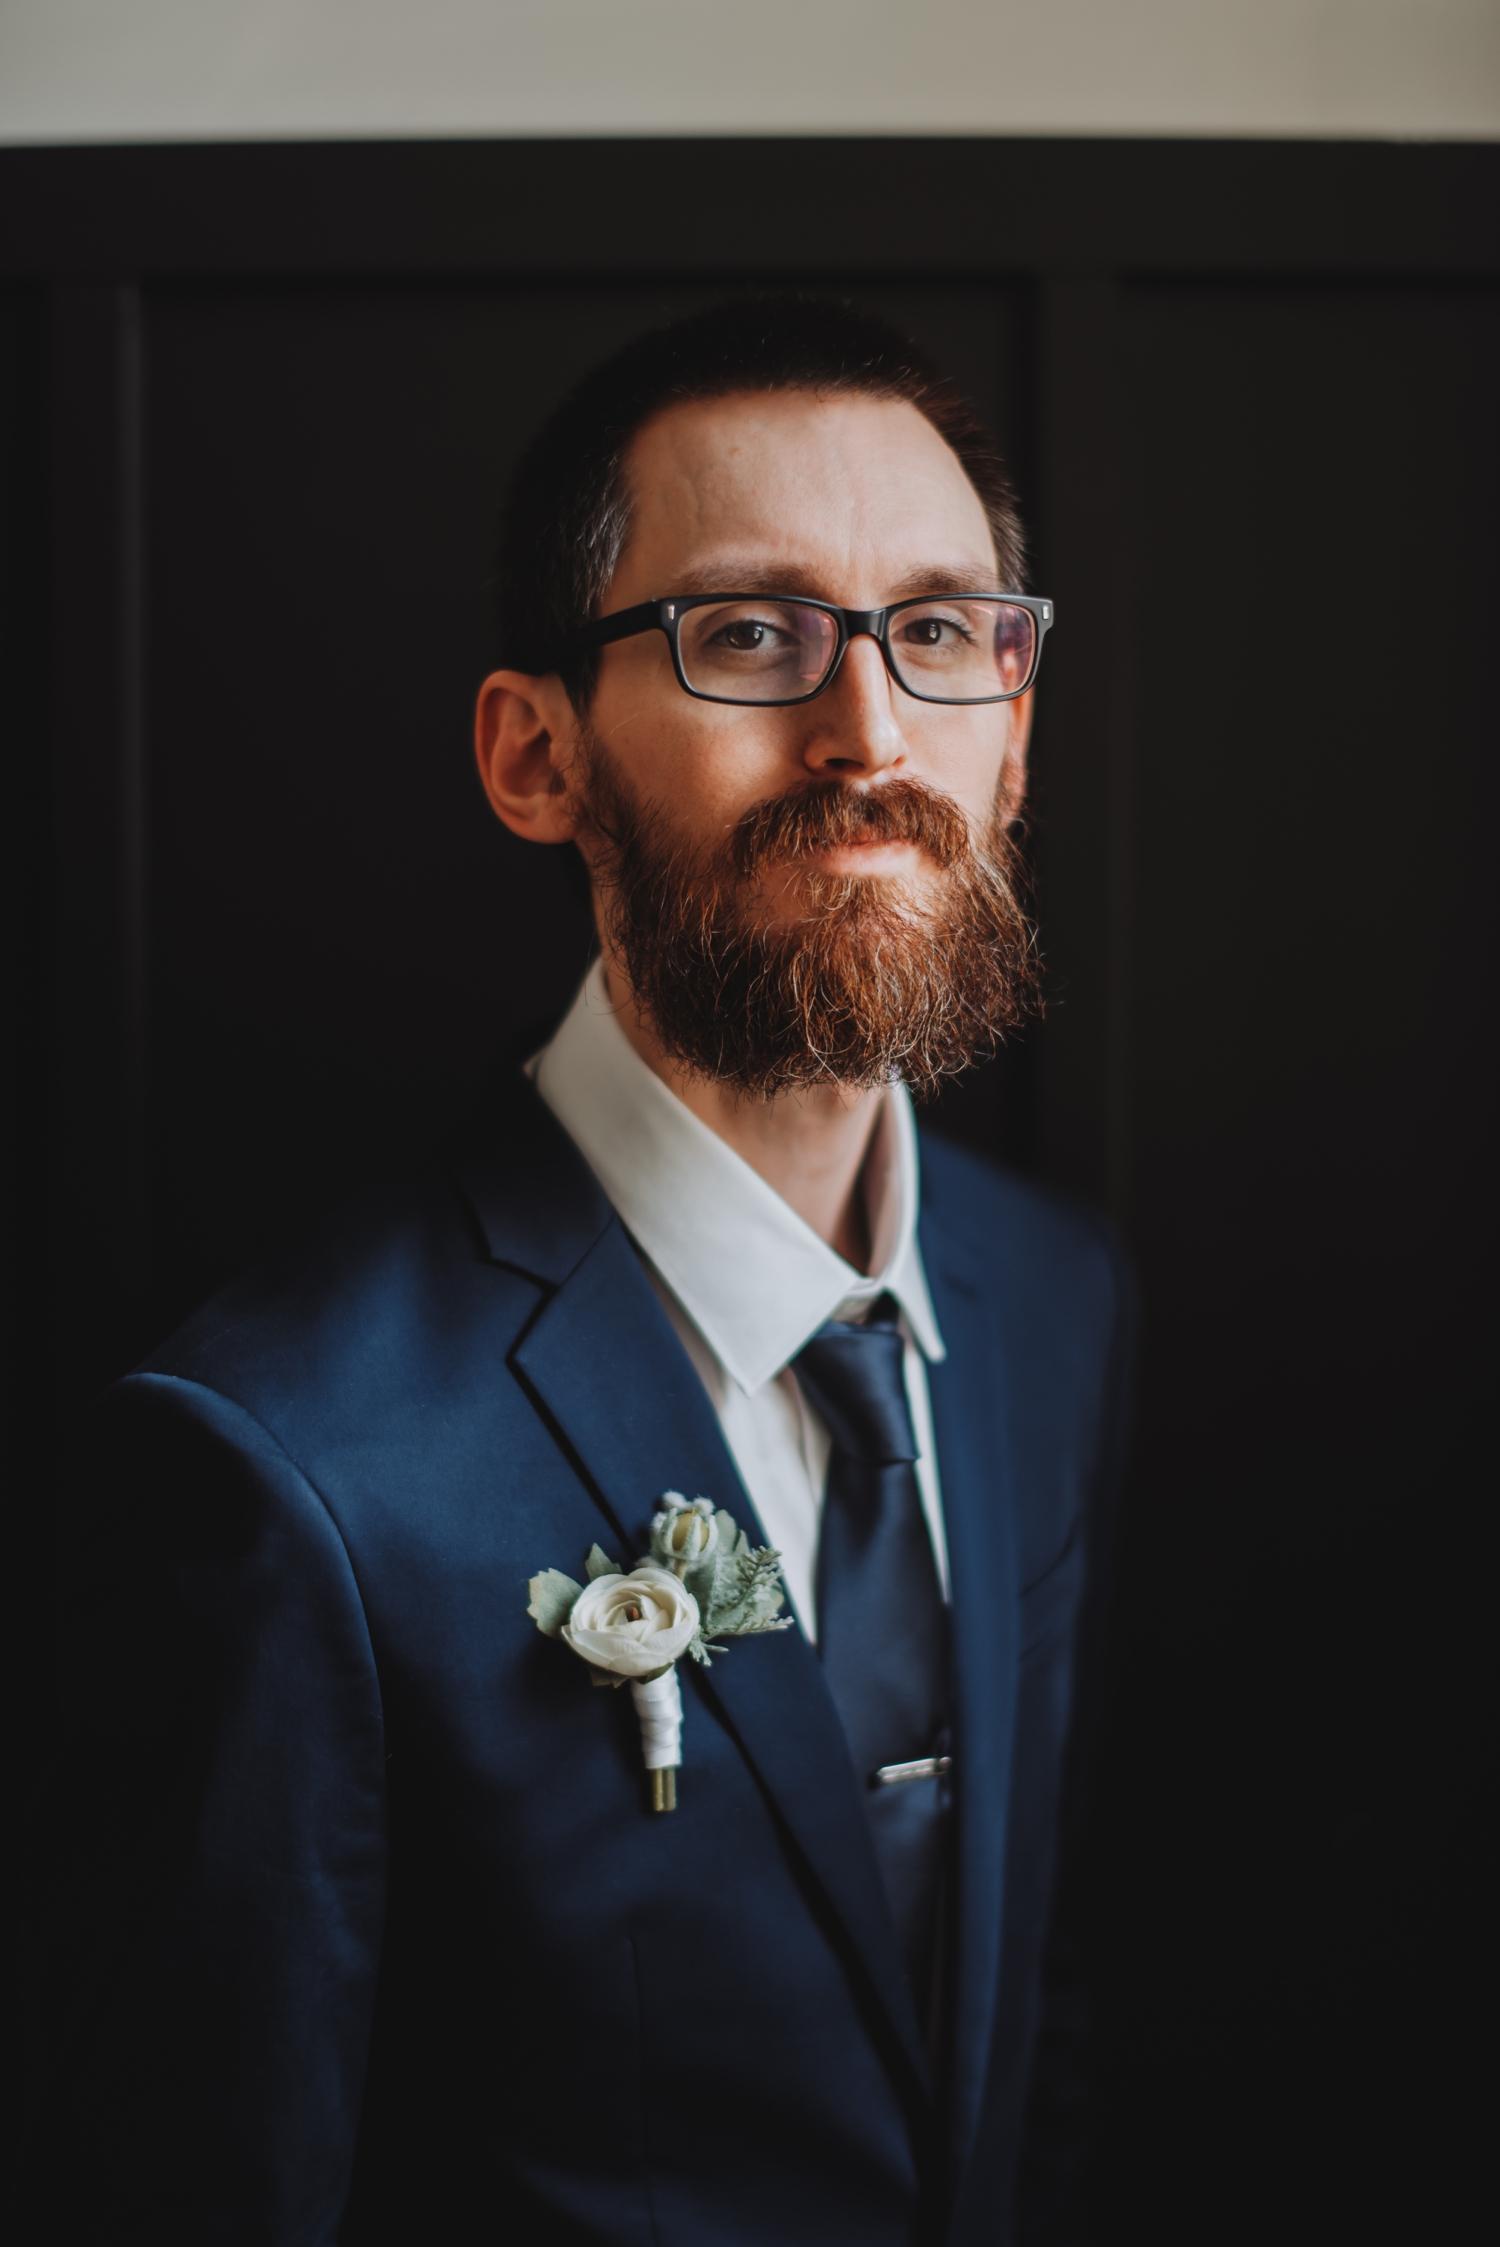 Chicago Elopement photographer - The Adamkovi, groom portrait